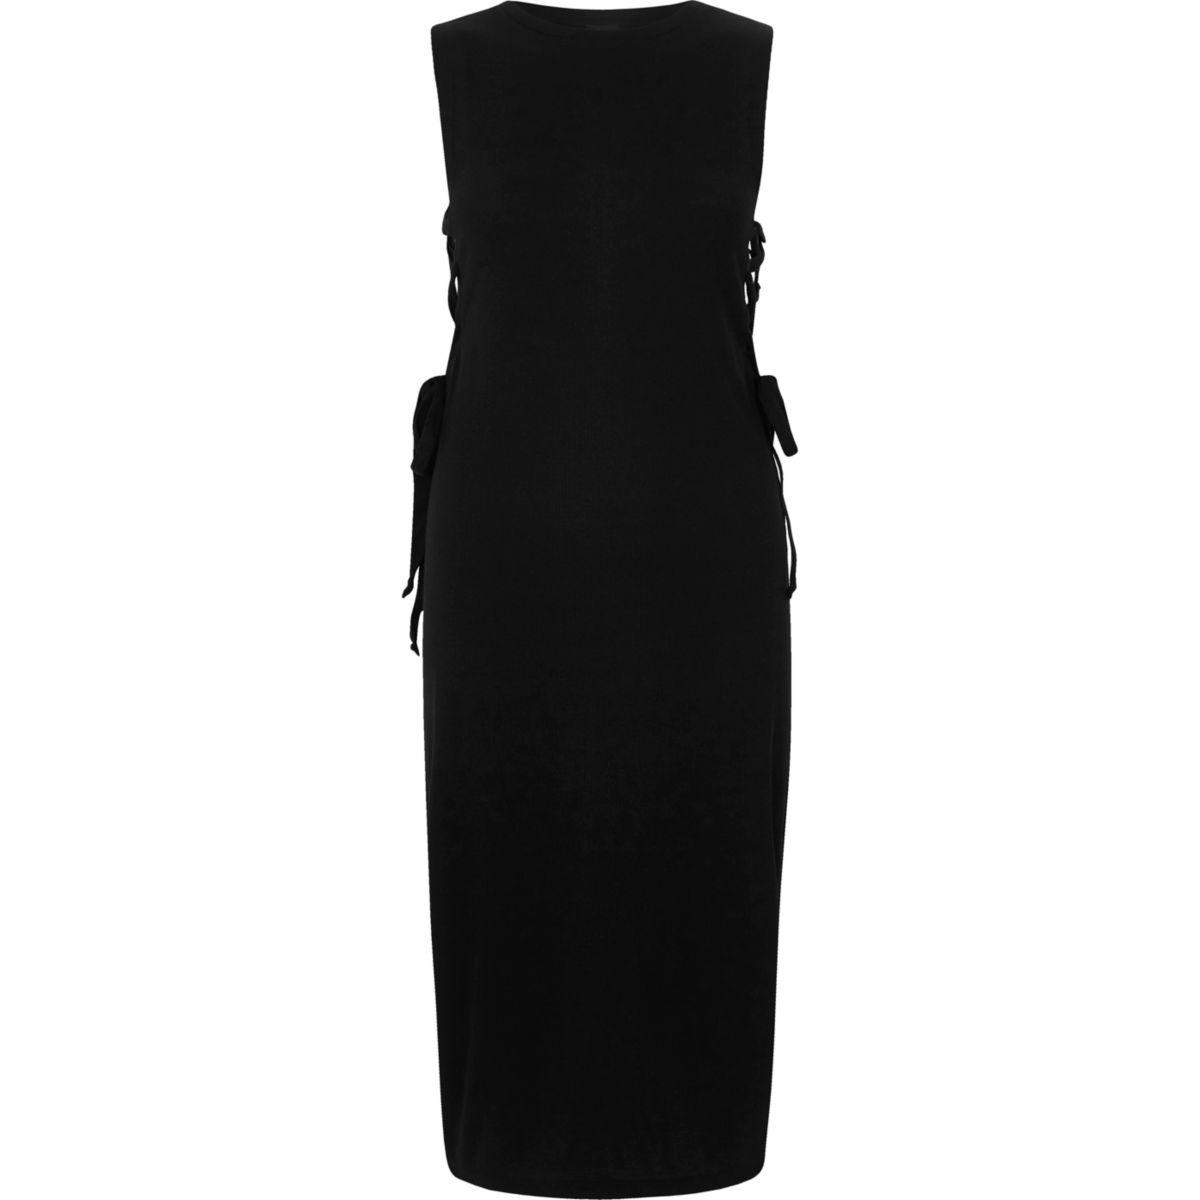 Black lace-up side bodycon dress